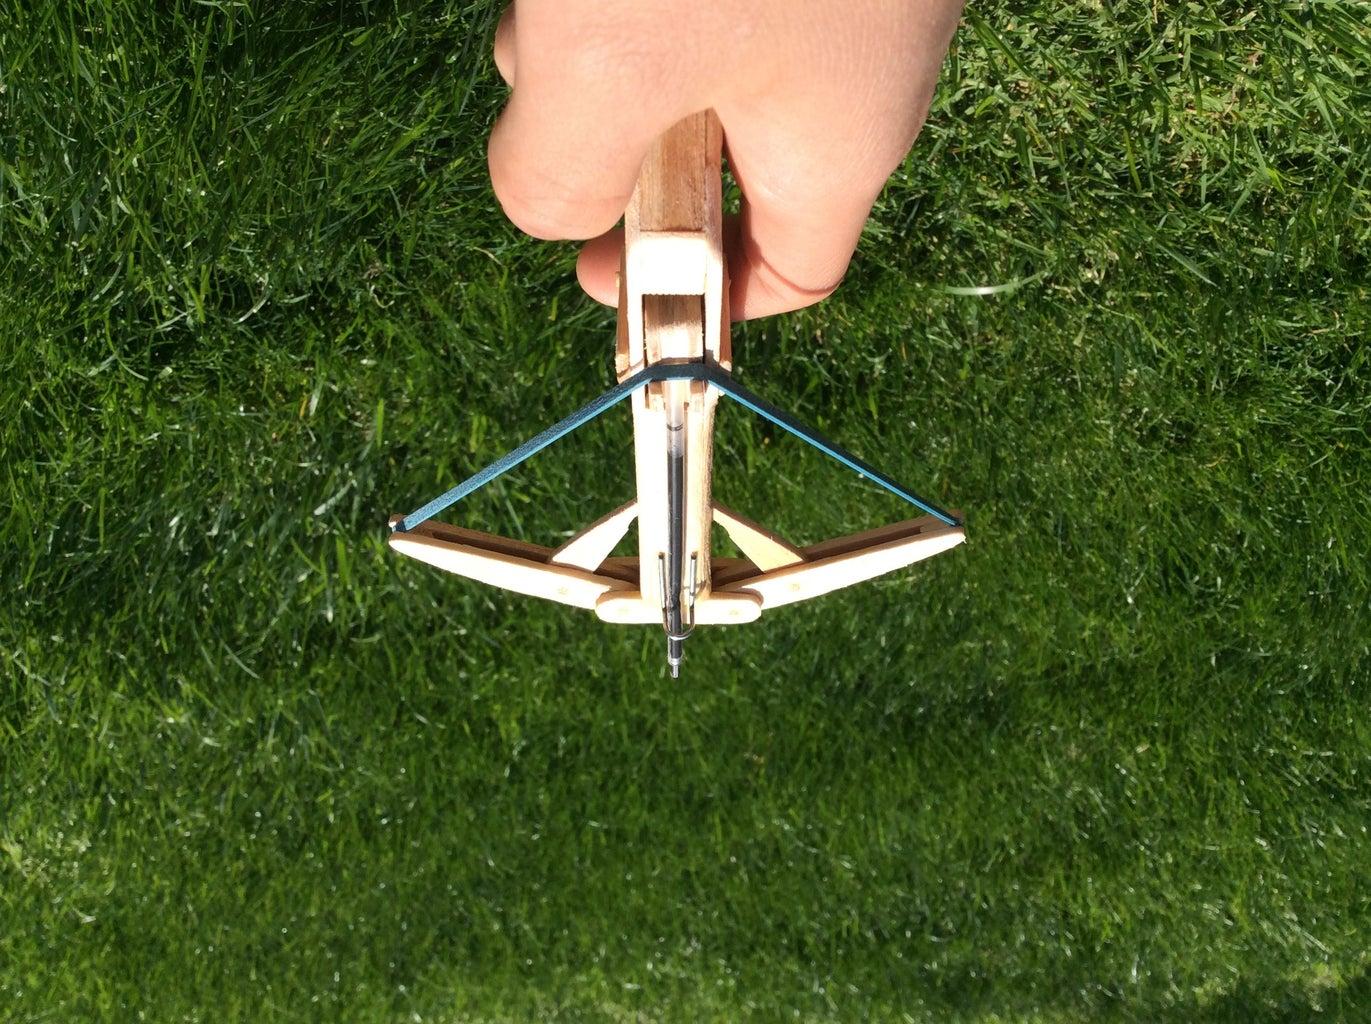 Popsicle Stick Folding X-Bow